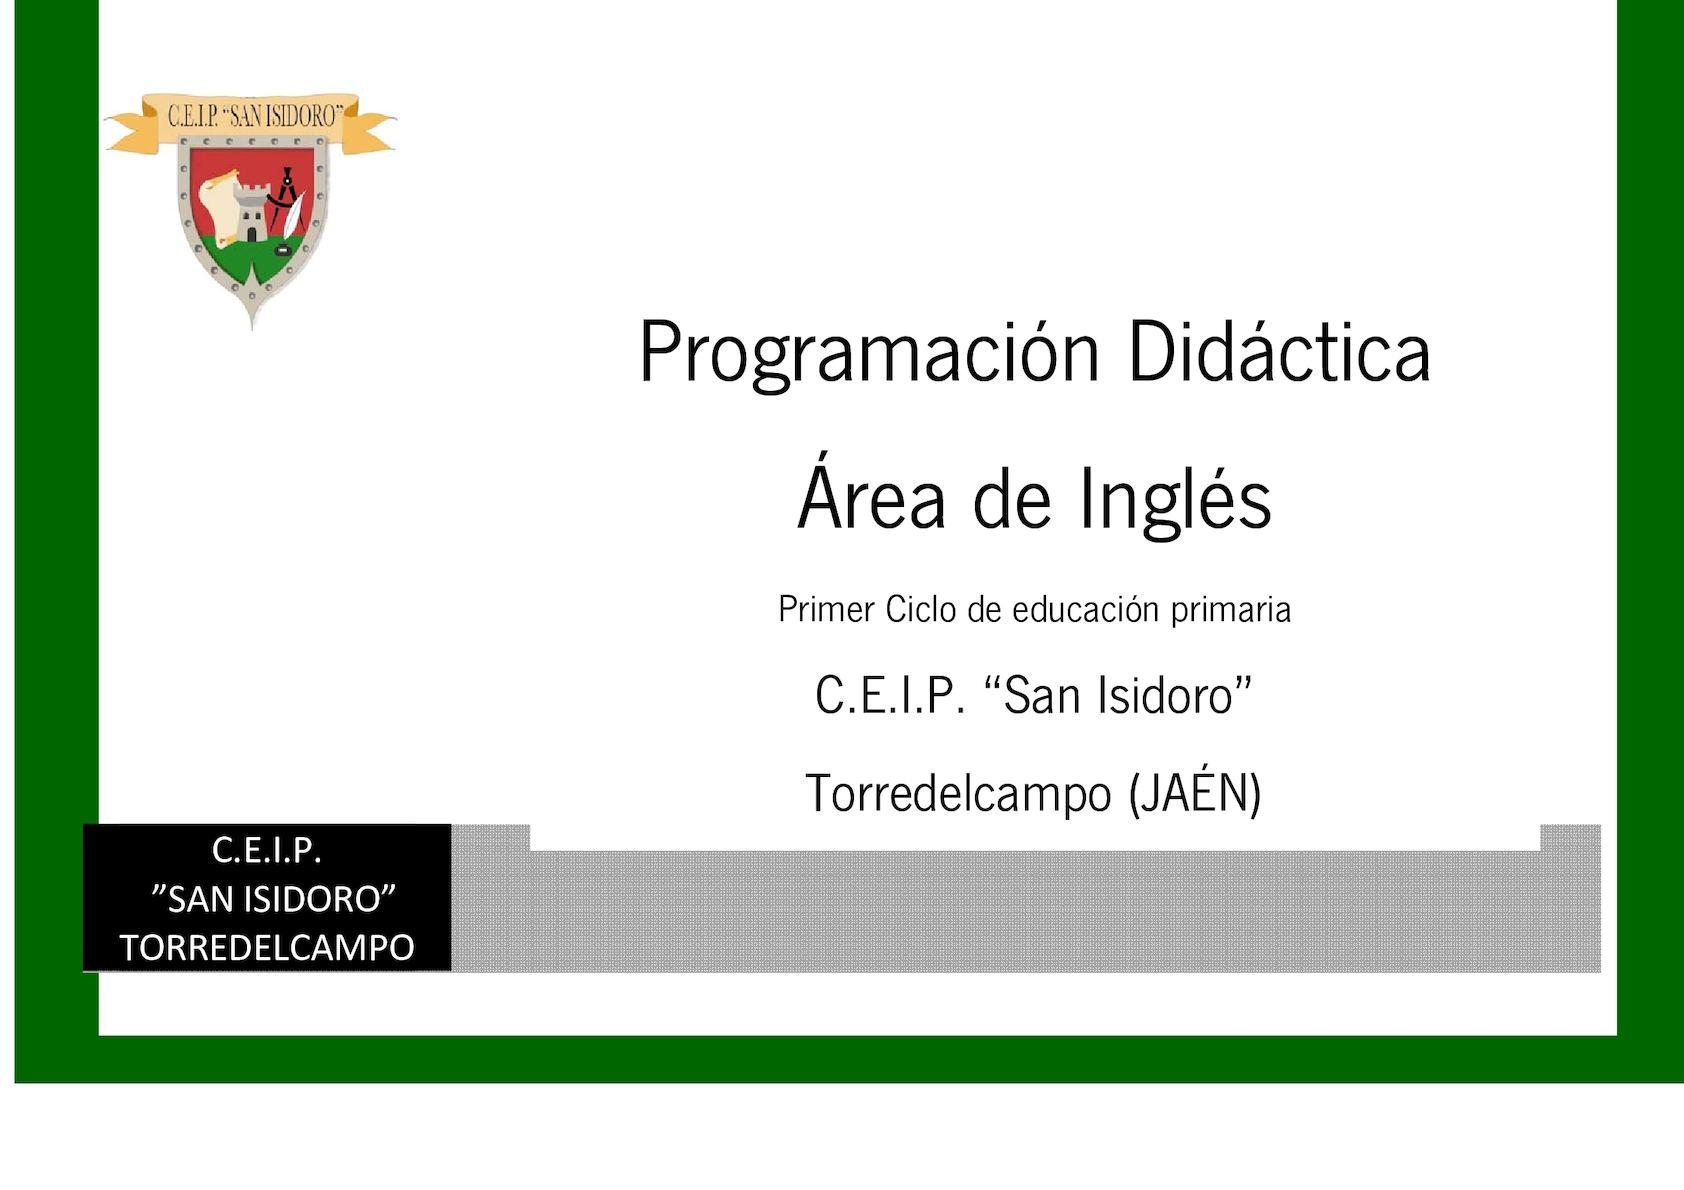 2 Programaciones 16 17 1 Ciclo Calaméo Inglés 3 X8OP0nkw